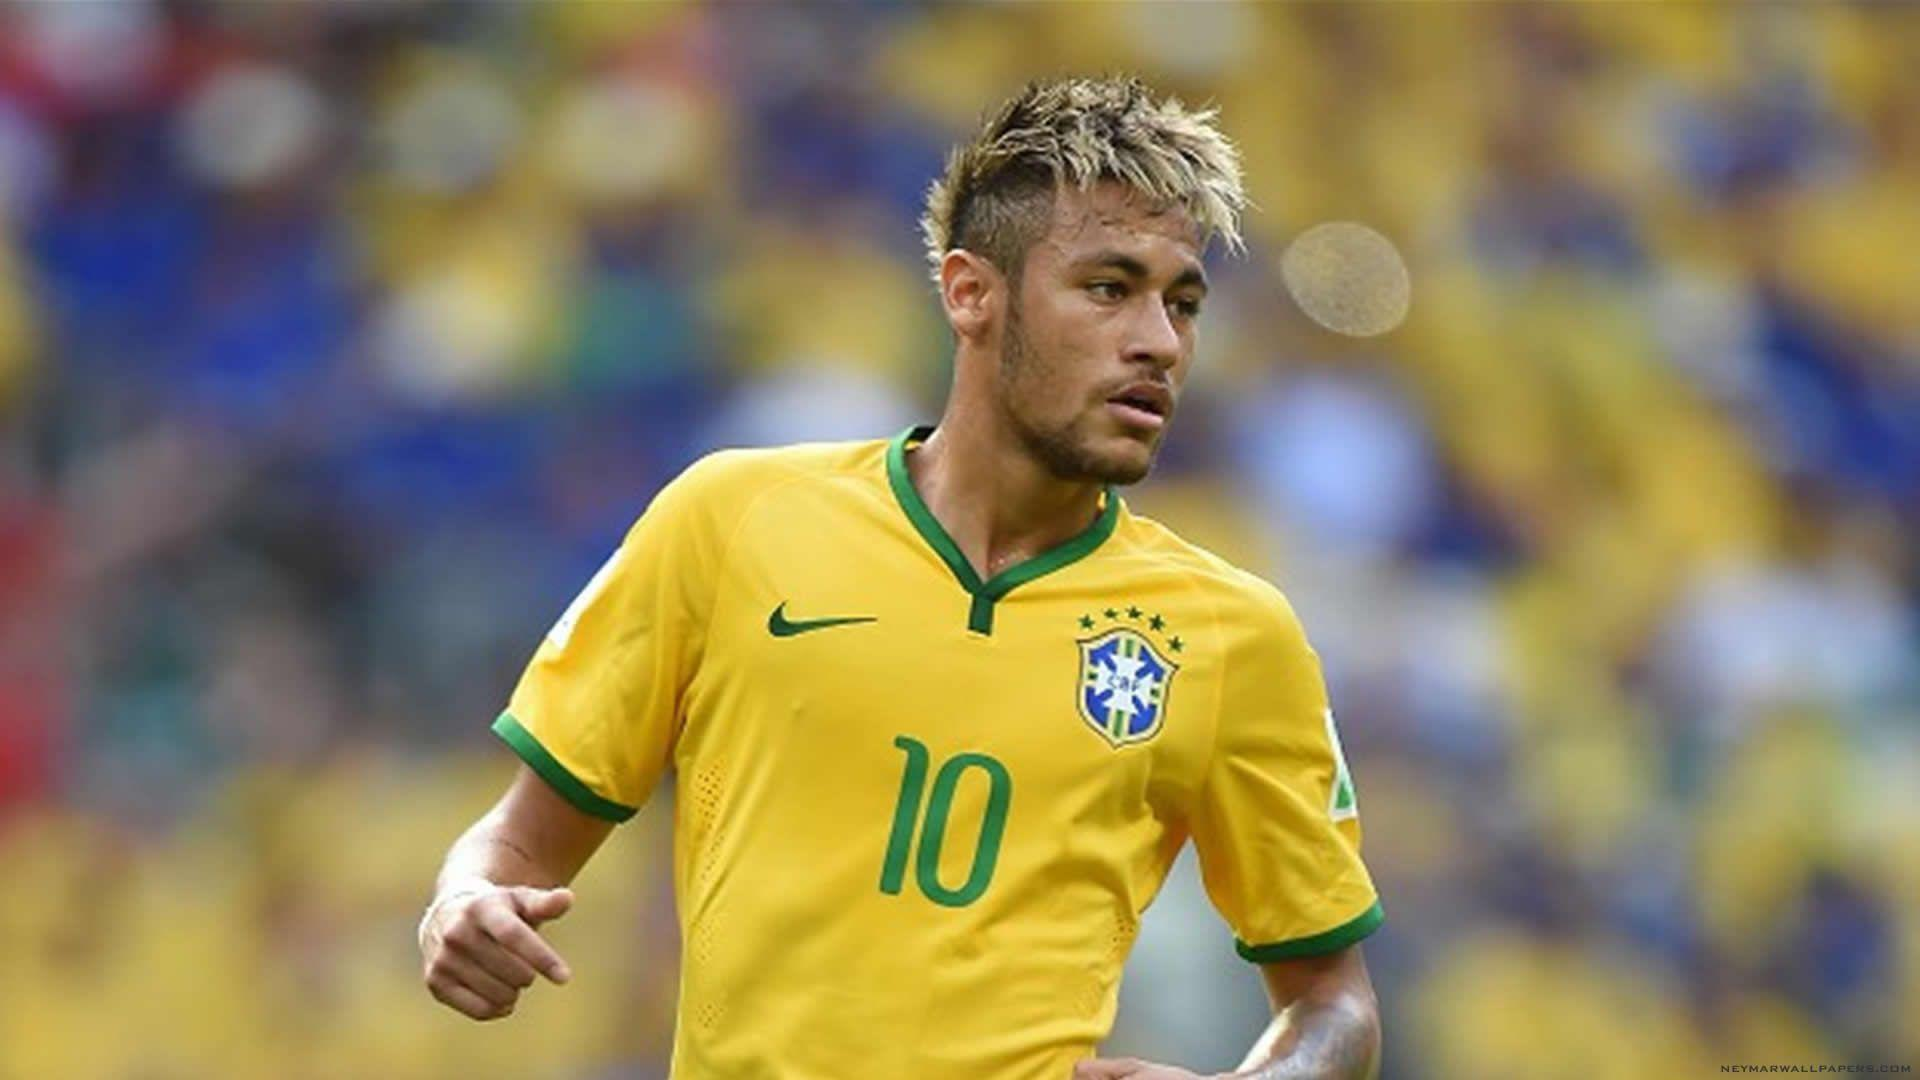 Hd Images Of Neymar: Neymar Backgrounds Brazil Flag 2016